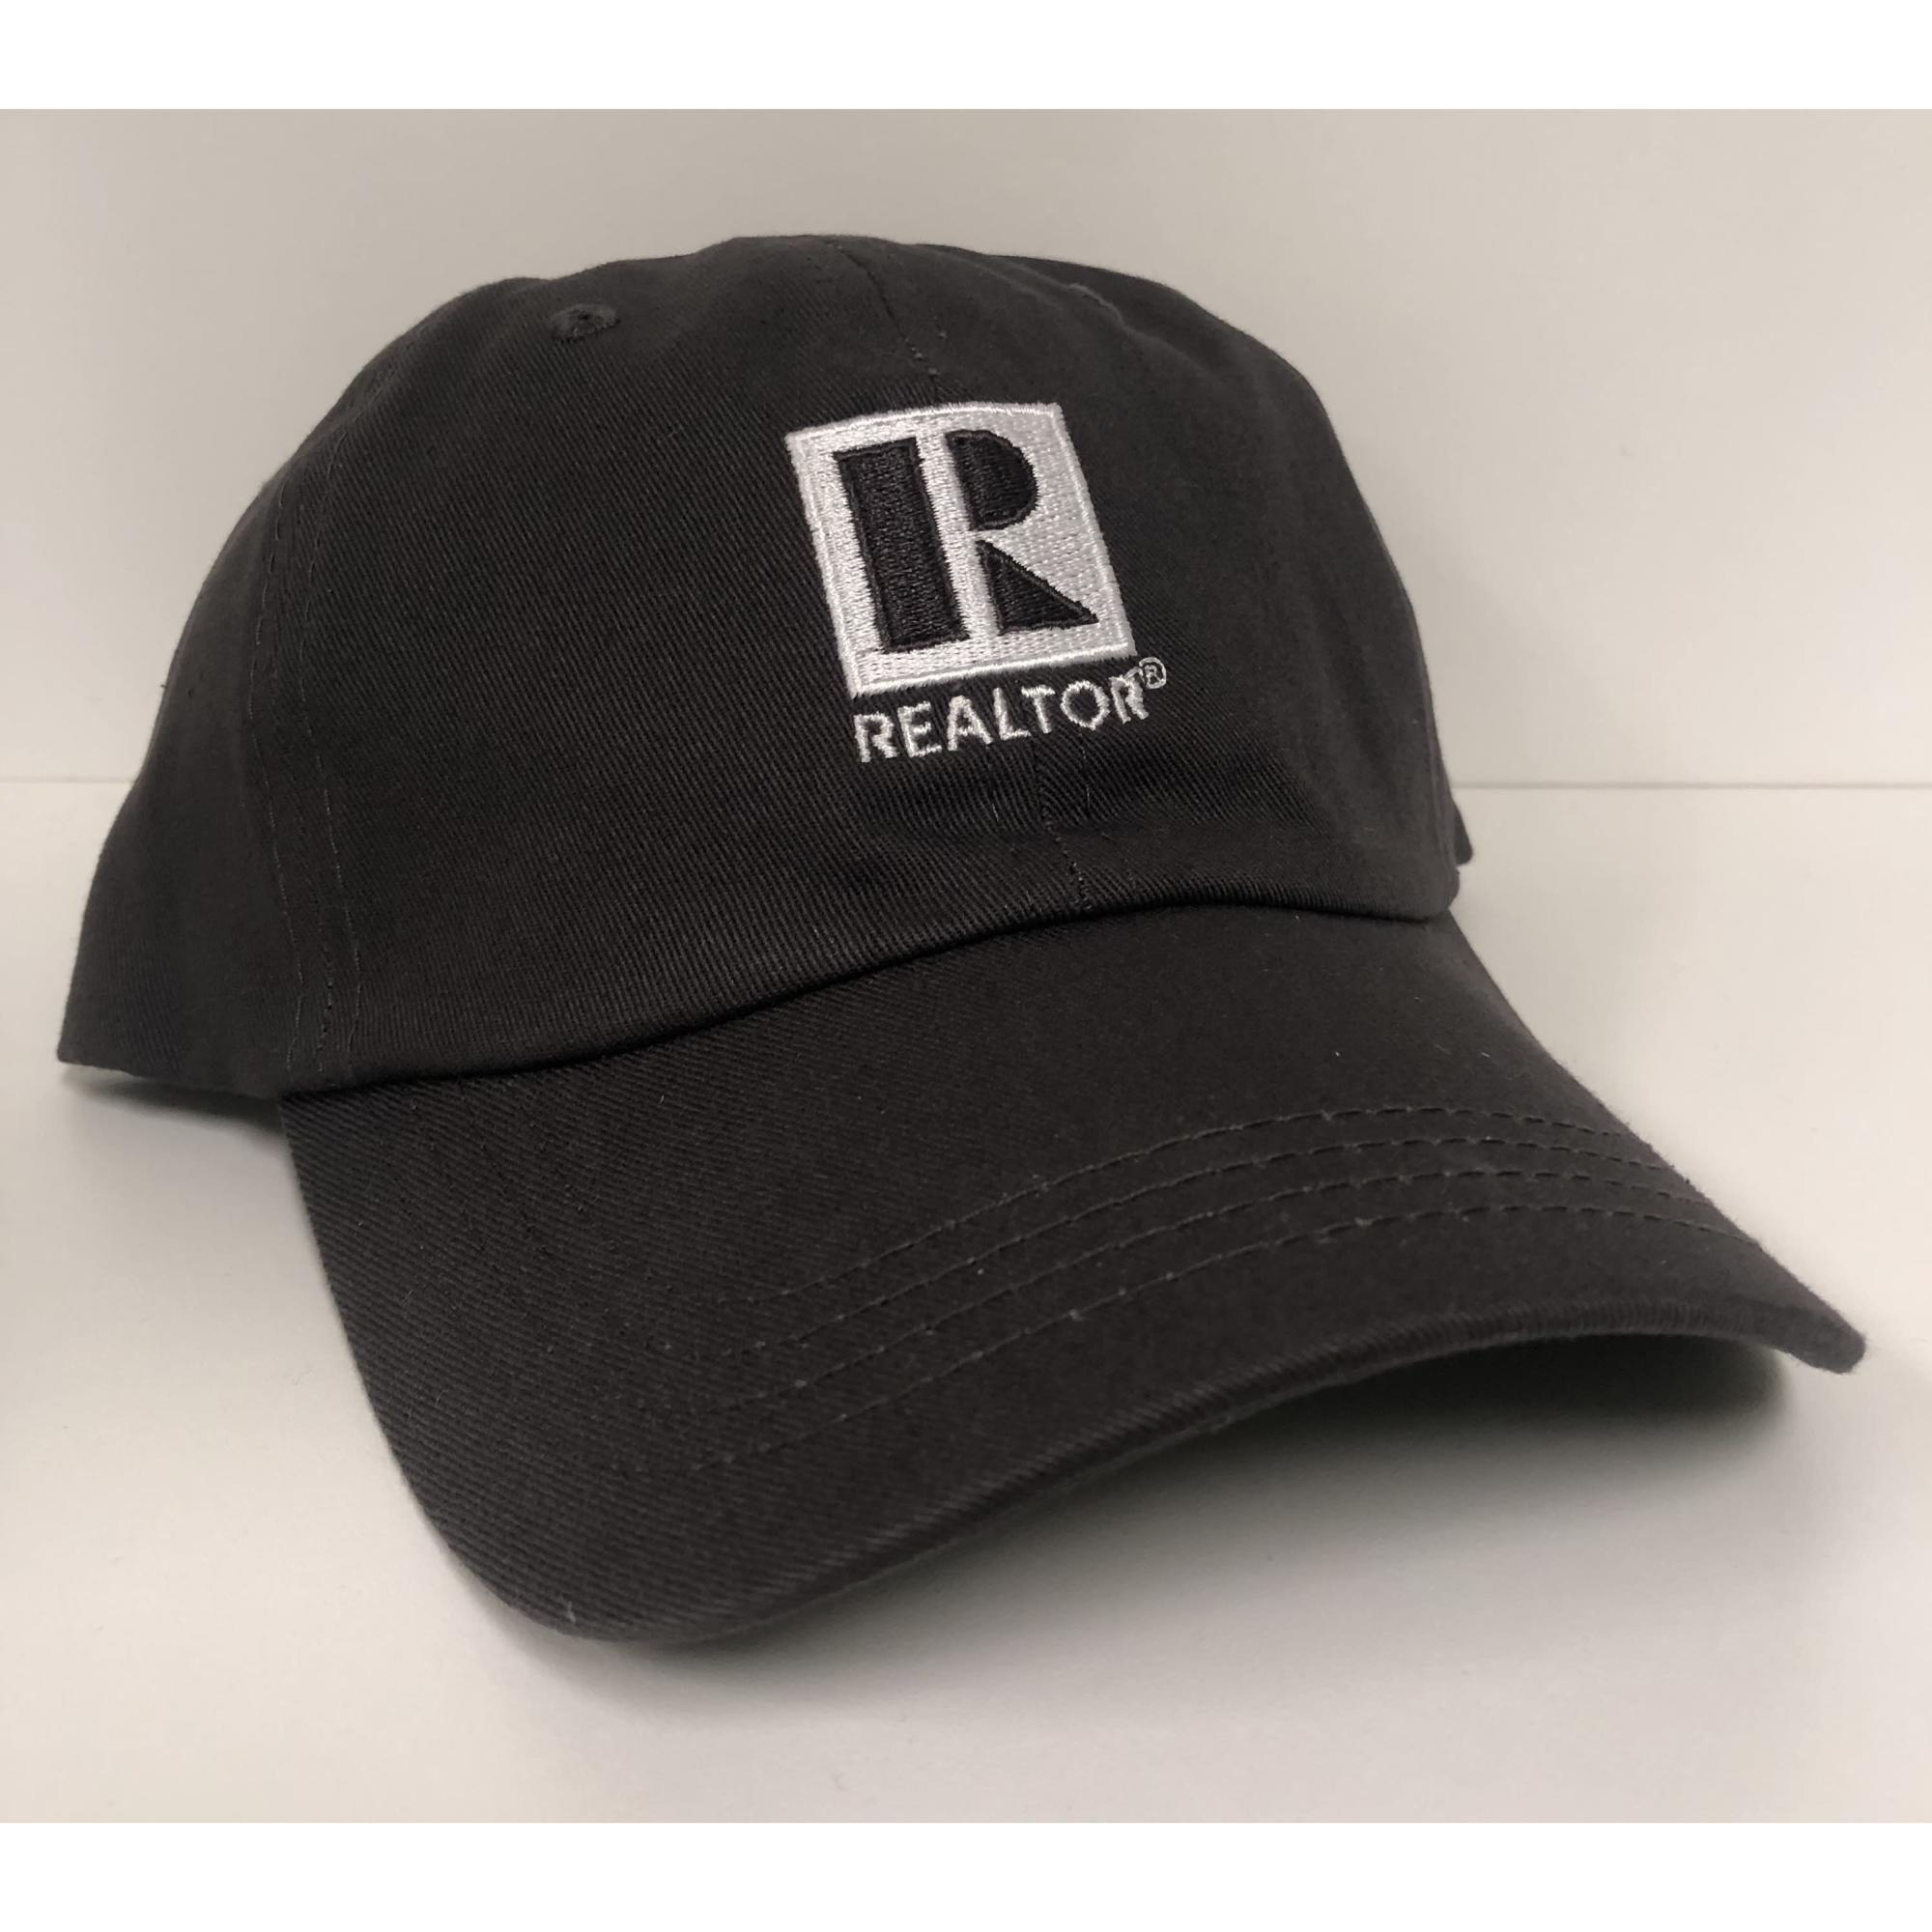 REALTOR® Hat BLACK provided by WCREALTORS